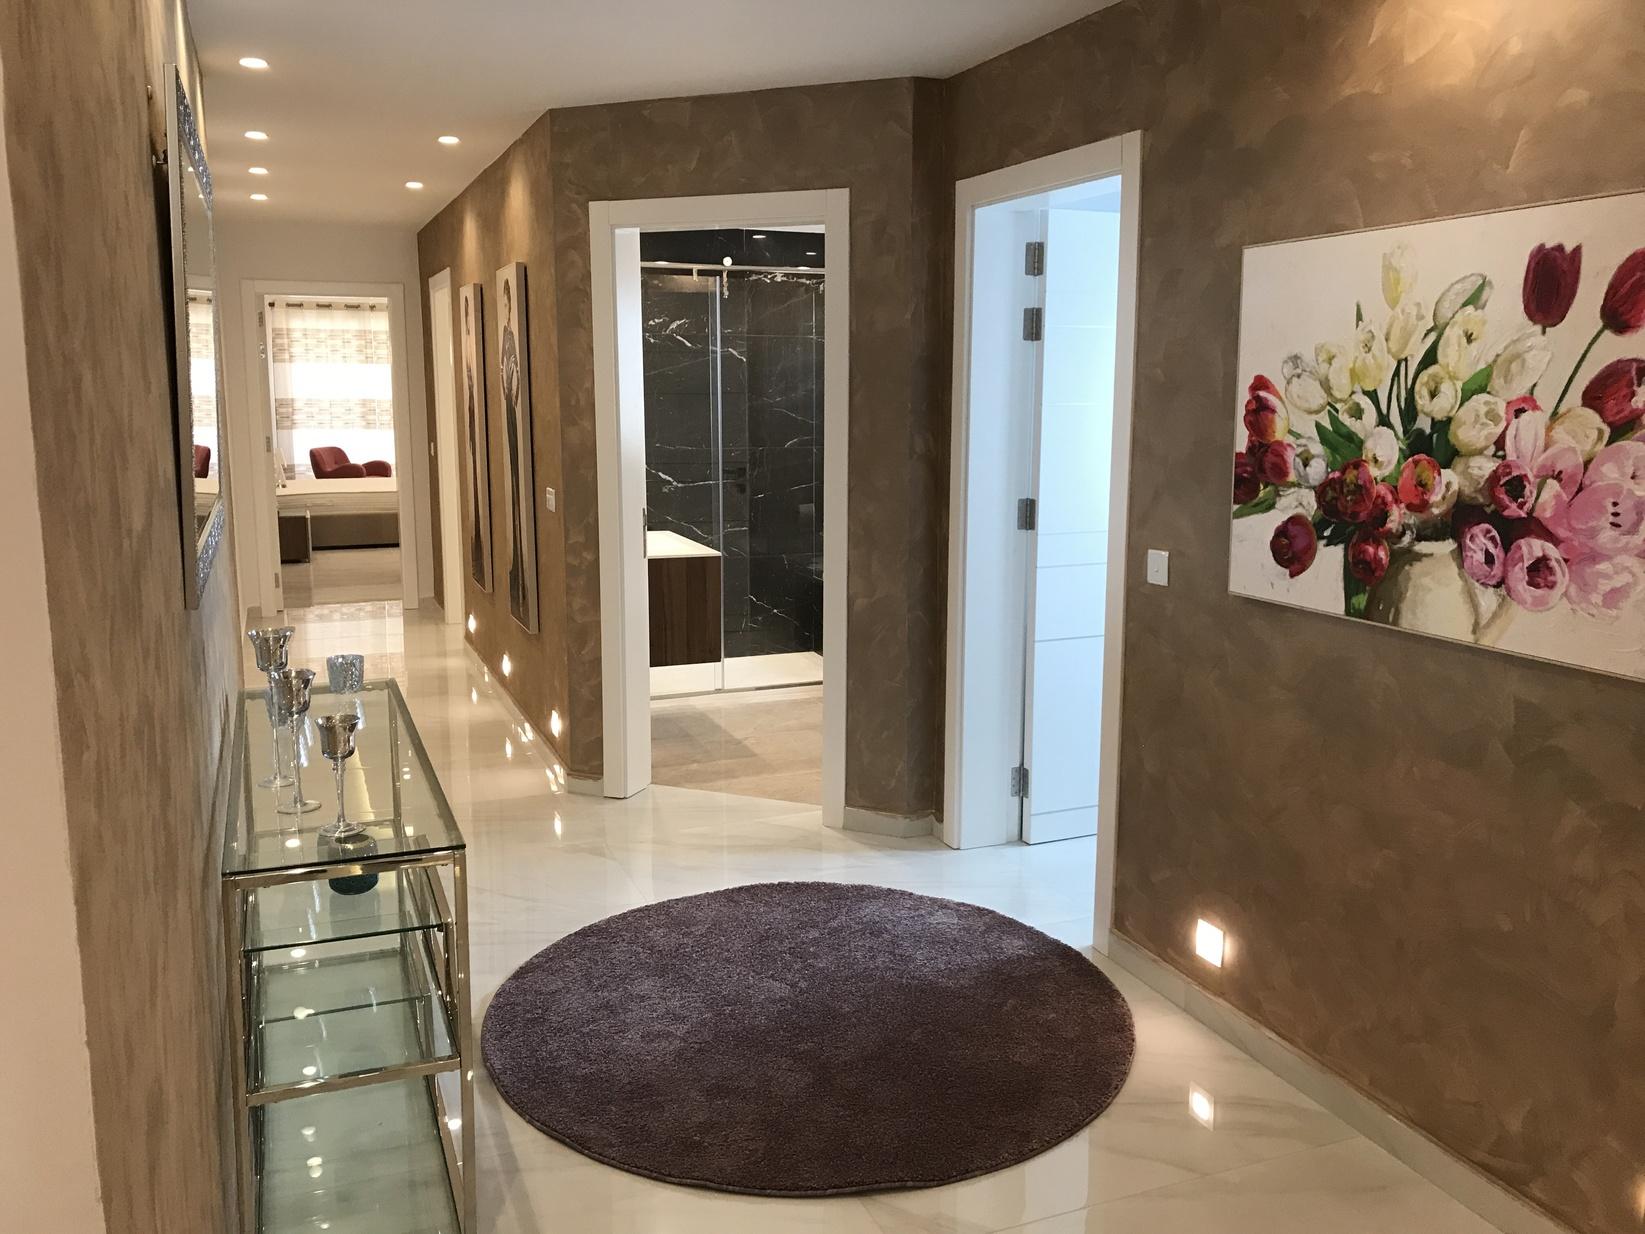 3 bed Apartment For Rent in Qawra, Qawra - thumb 28